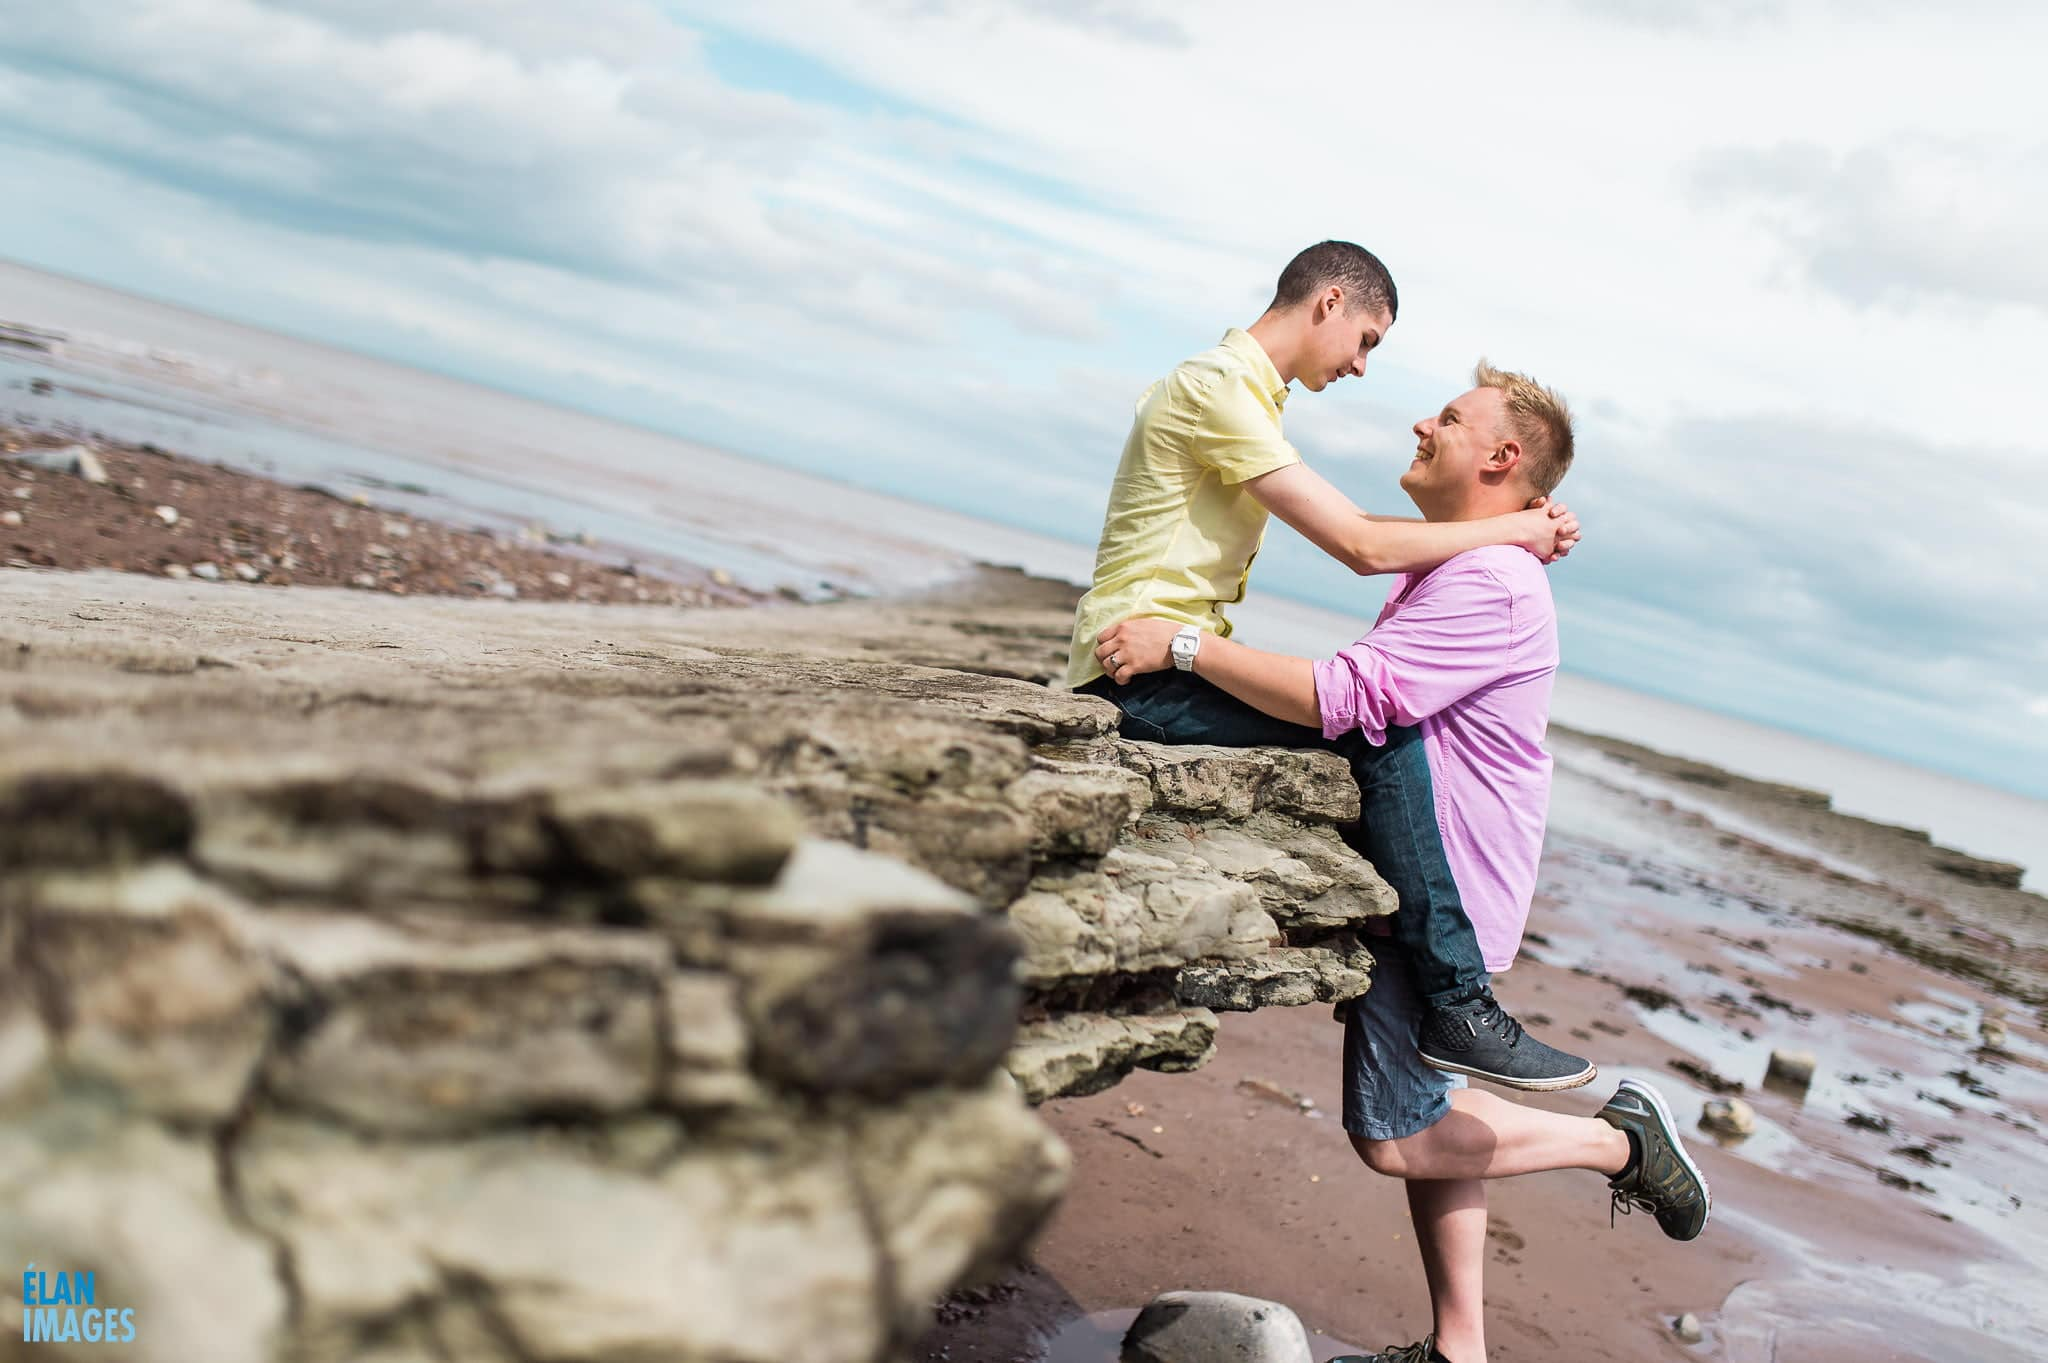 Engagement photo shoot at St Audrie's Bay, Devon 28